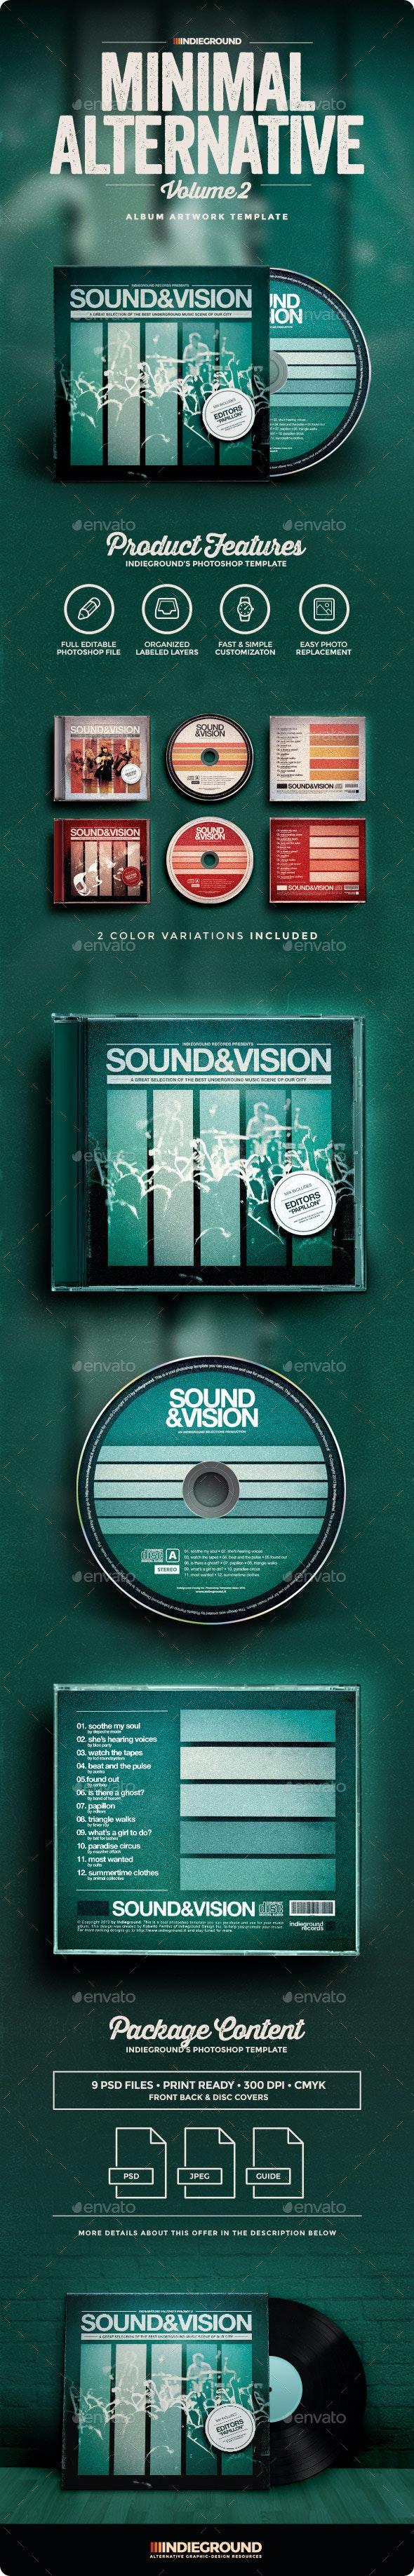 Minimal Alternative CD Album Artwork Vol. 2 - CD & DVD Artwork Print Templates